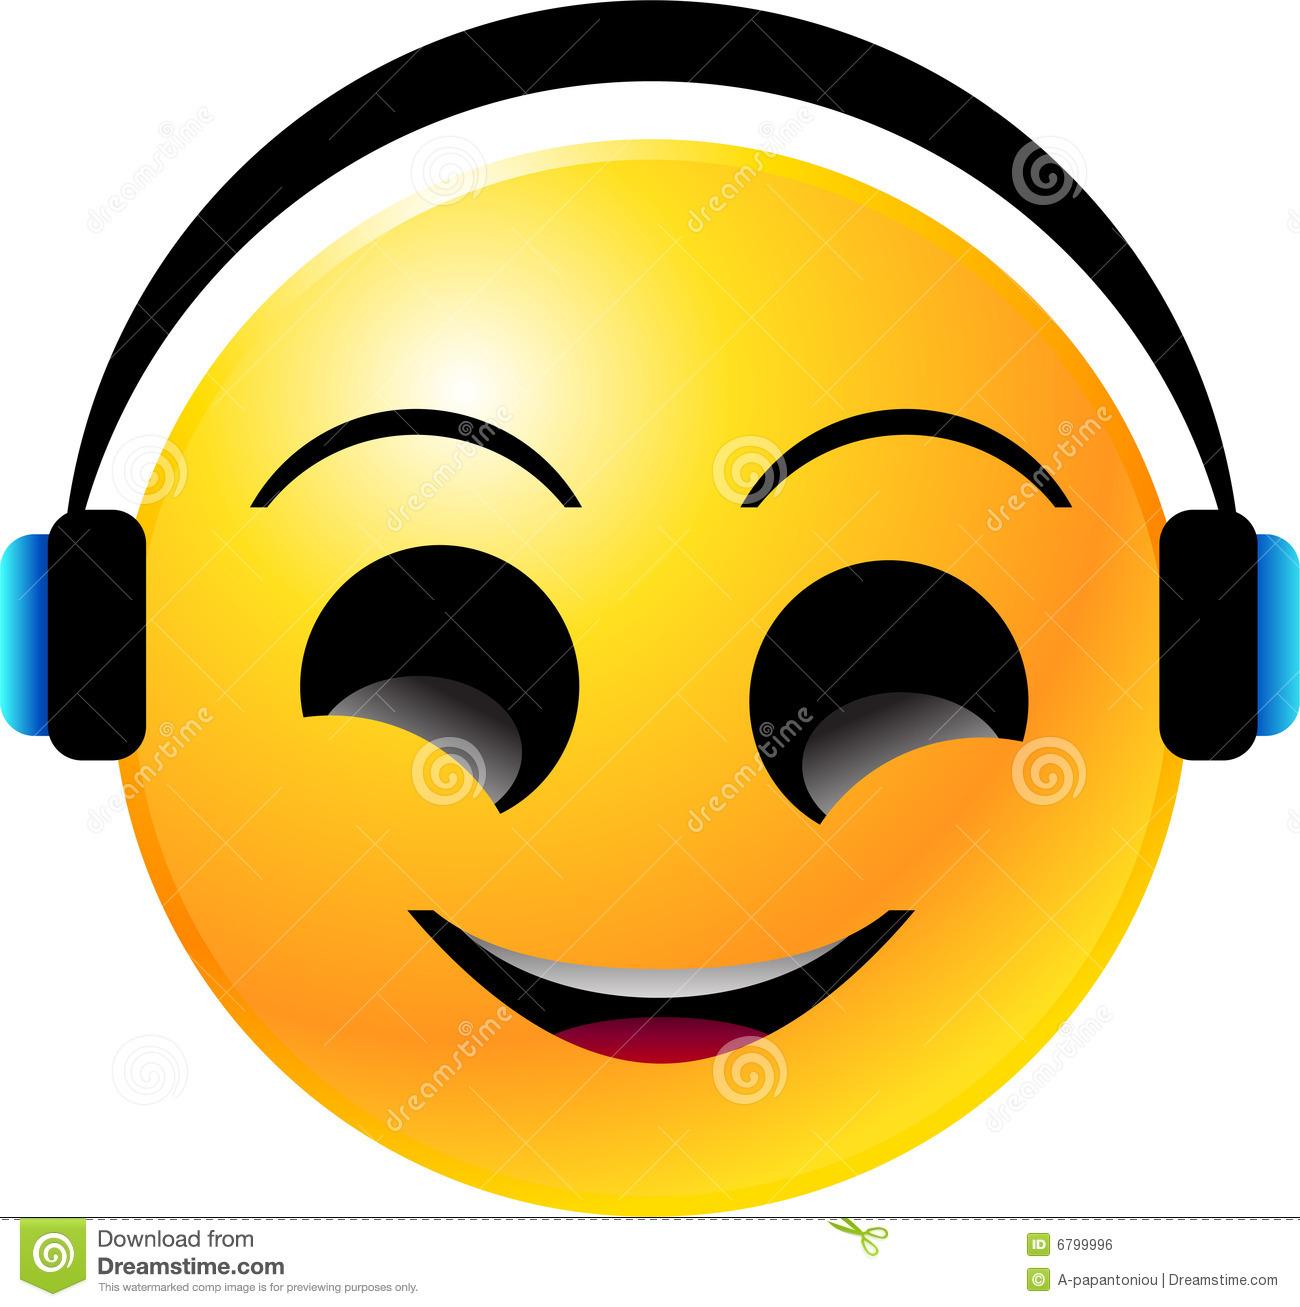 emoticon smiley face clipart panda free clipart images rh clipartpanda com Animated Smiley Face Clip Art Girl Smiley Face Clip Art